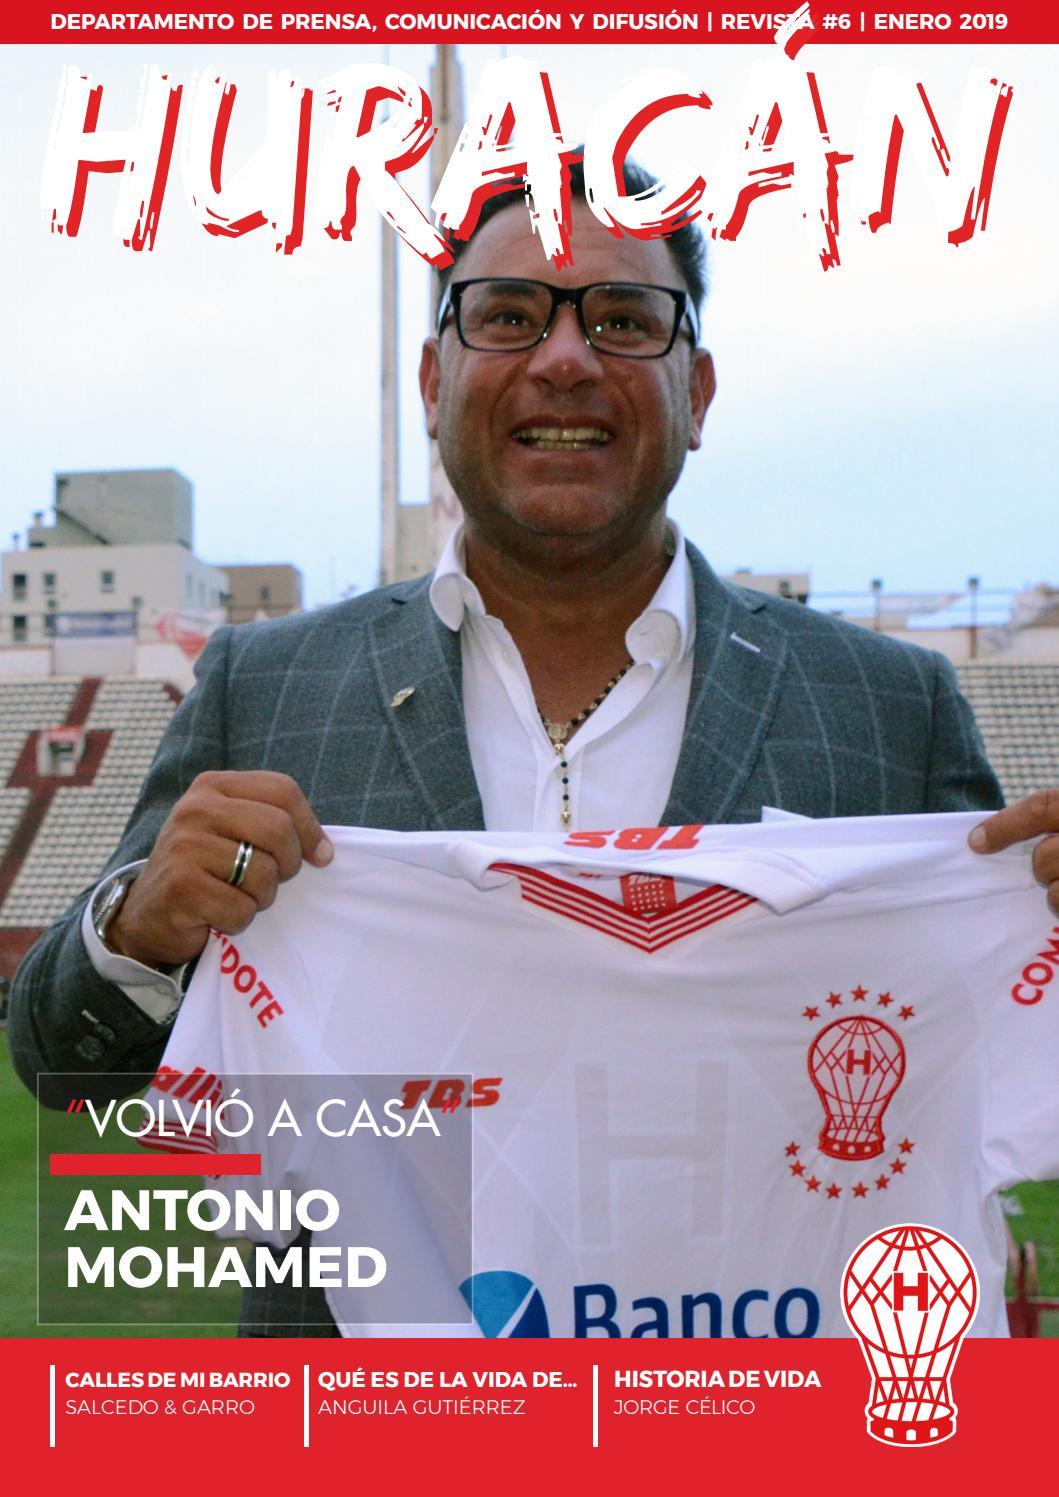 Revista Atlético Huracán By 2019 Issuu Club Enero bgY6vyf7